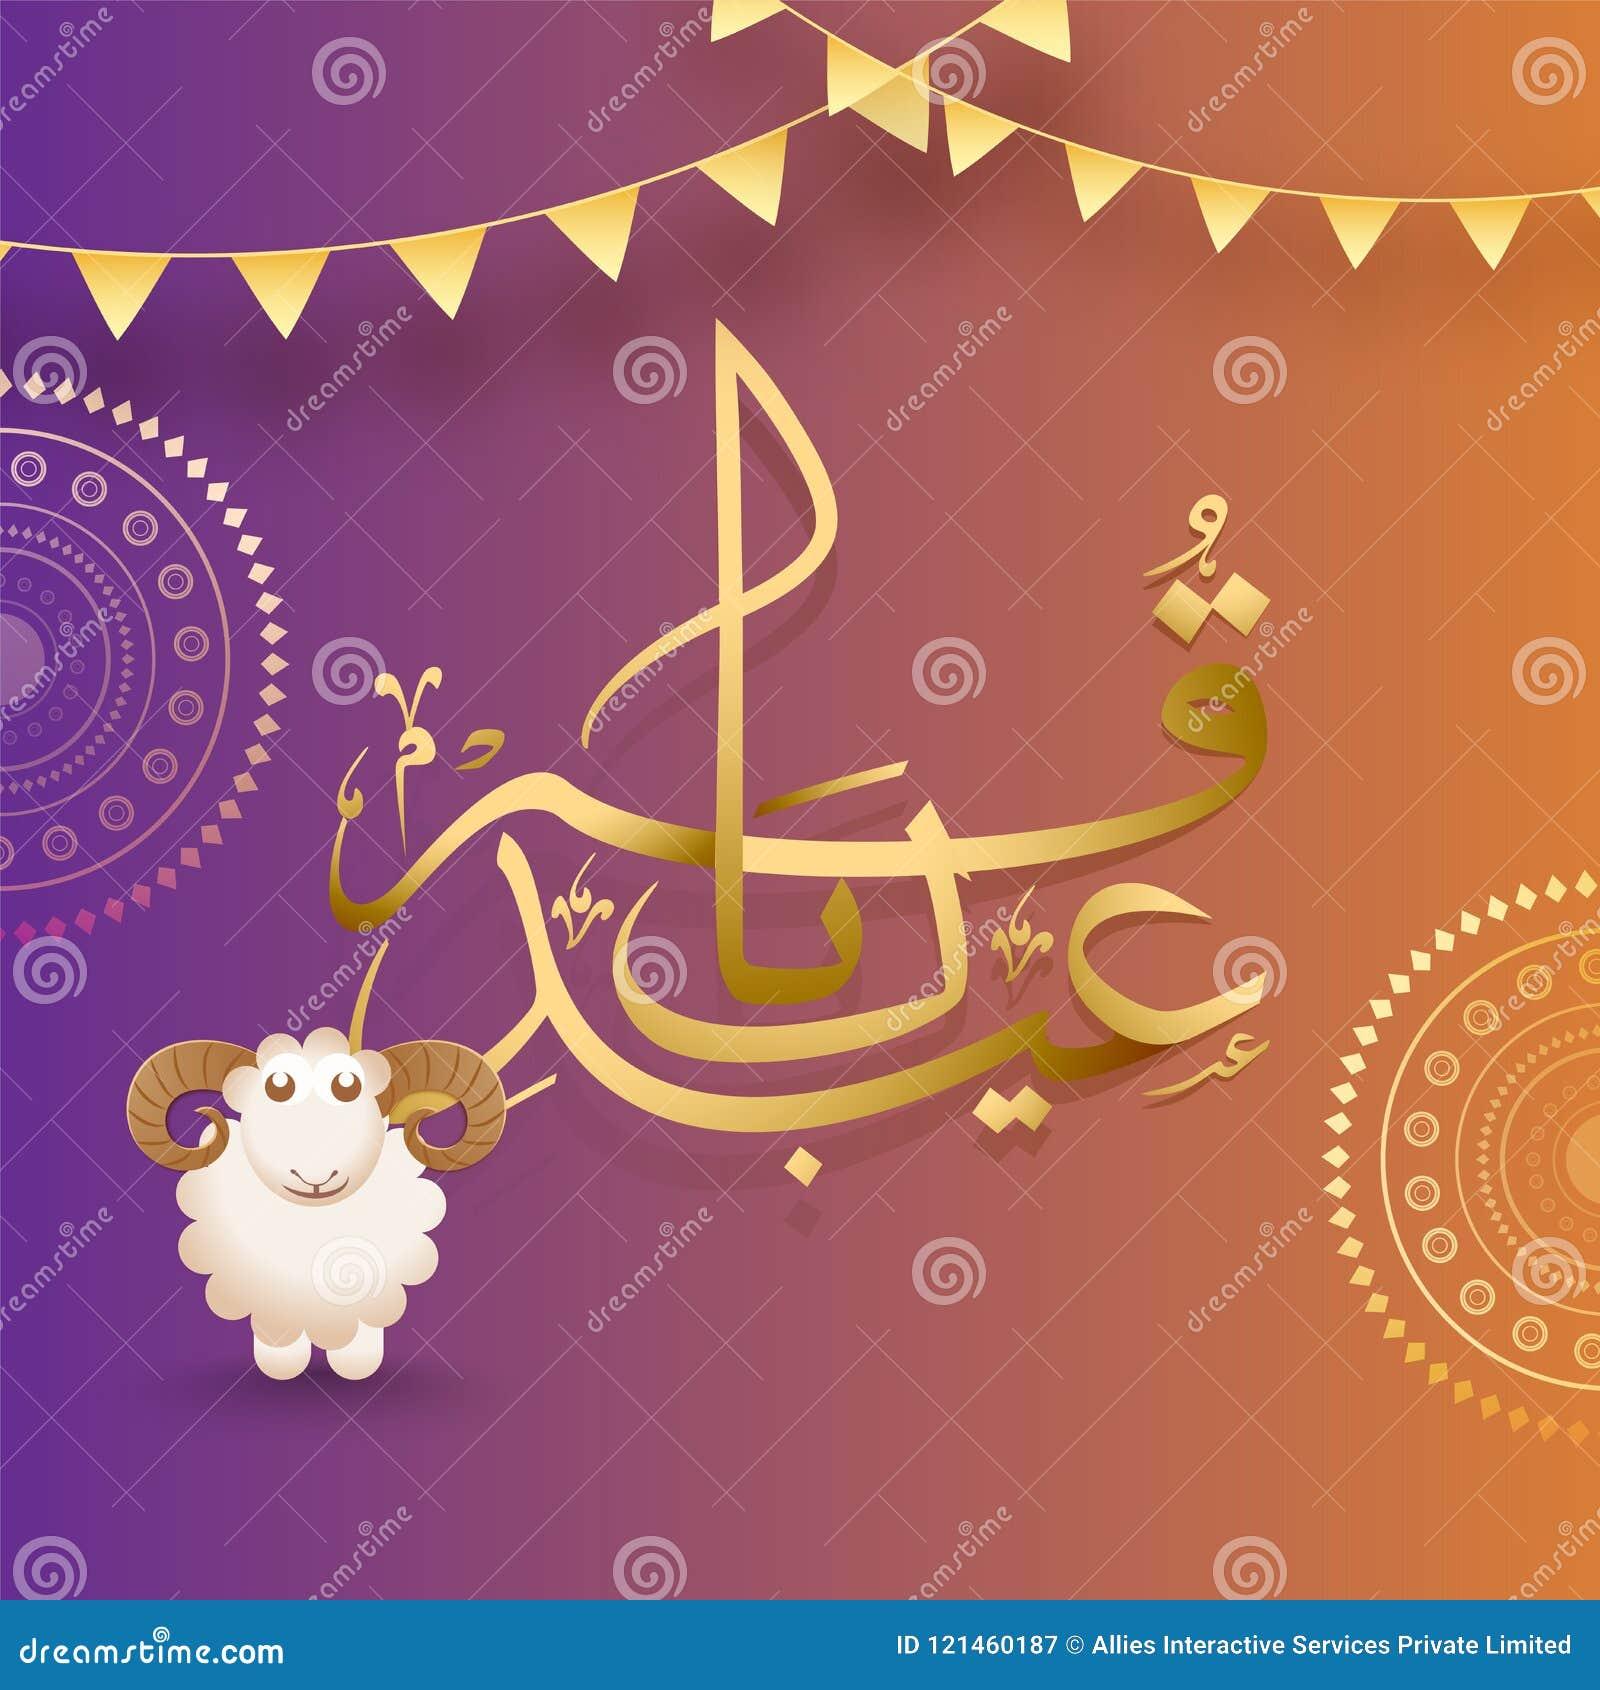 Arabic Islamic Calligraphy Of Eid Al Adha And Sheep Animal On Sh Stock  Illustration - Illustration of eidulqurba, eiduladha: 121460187